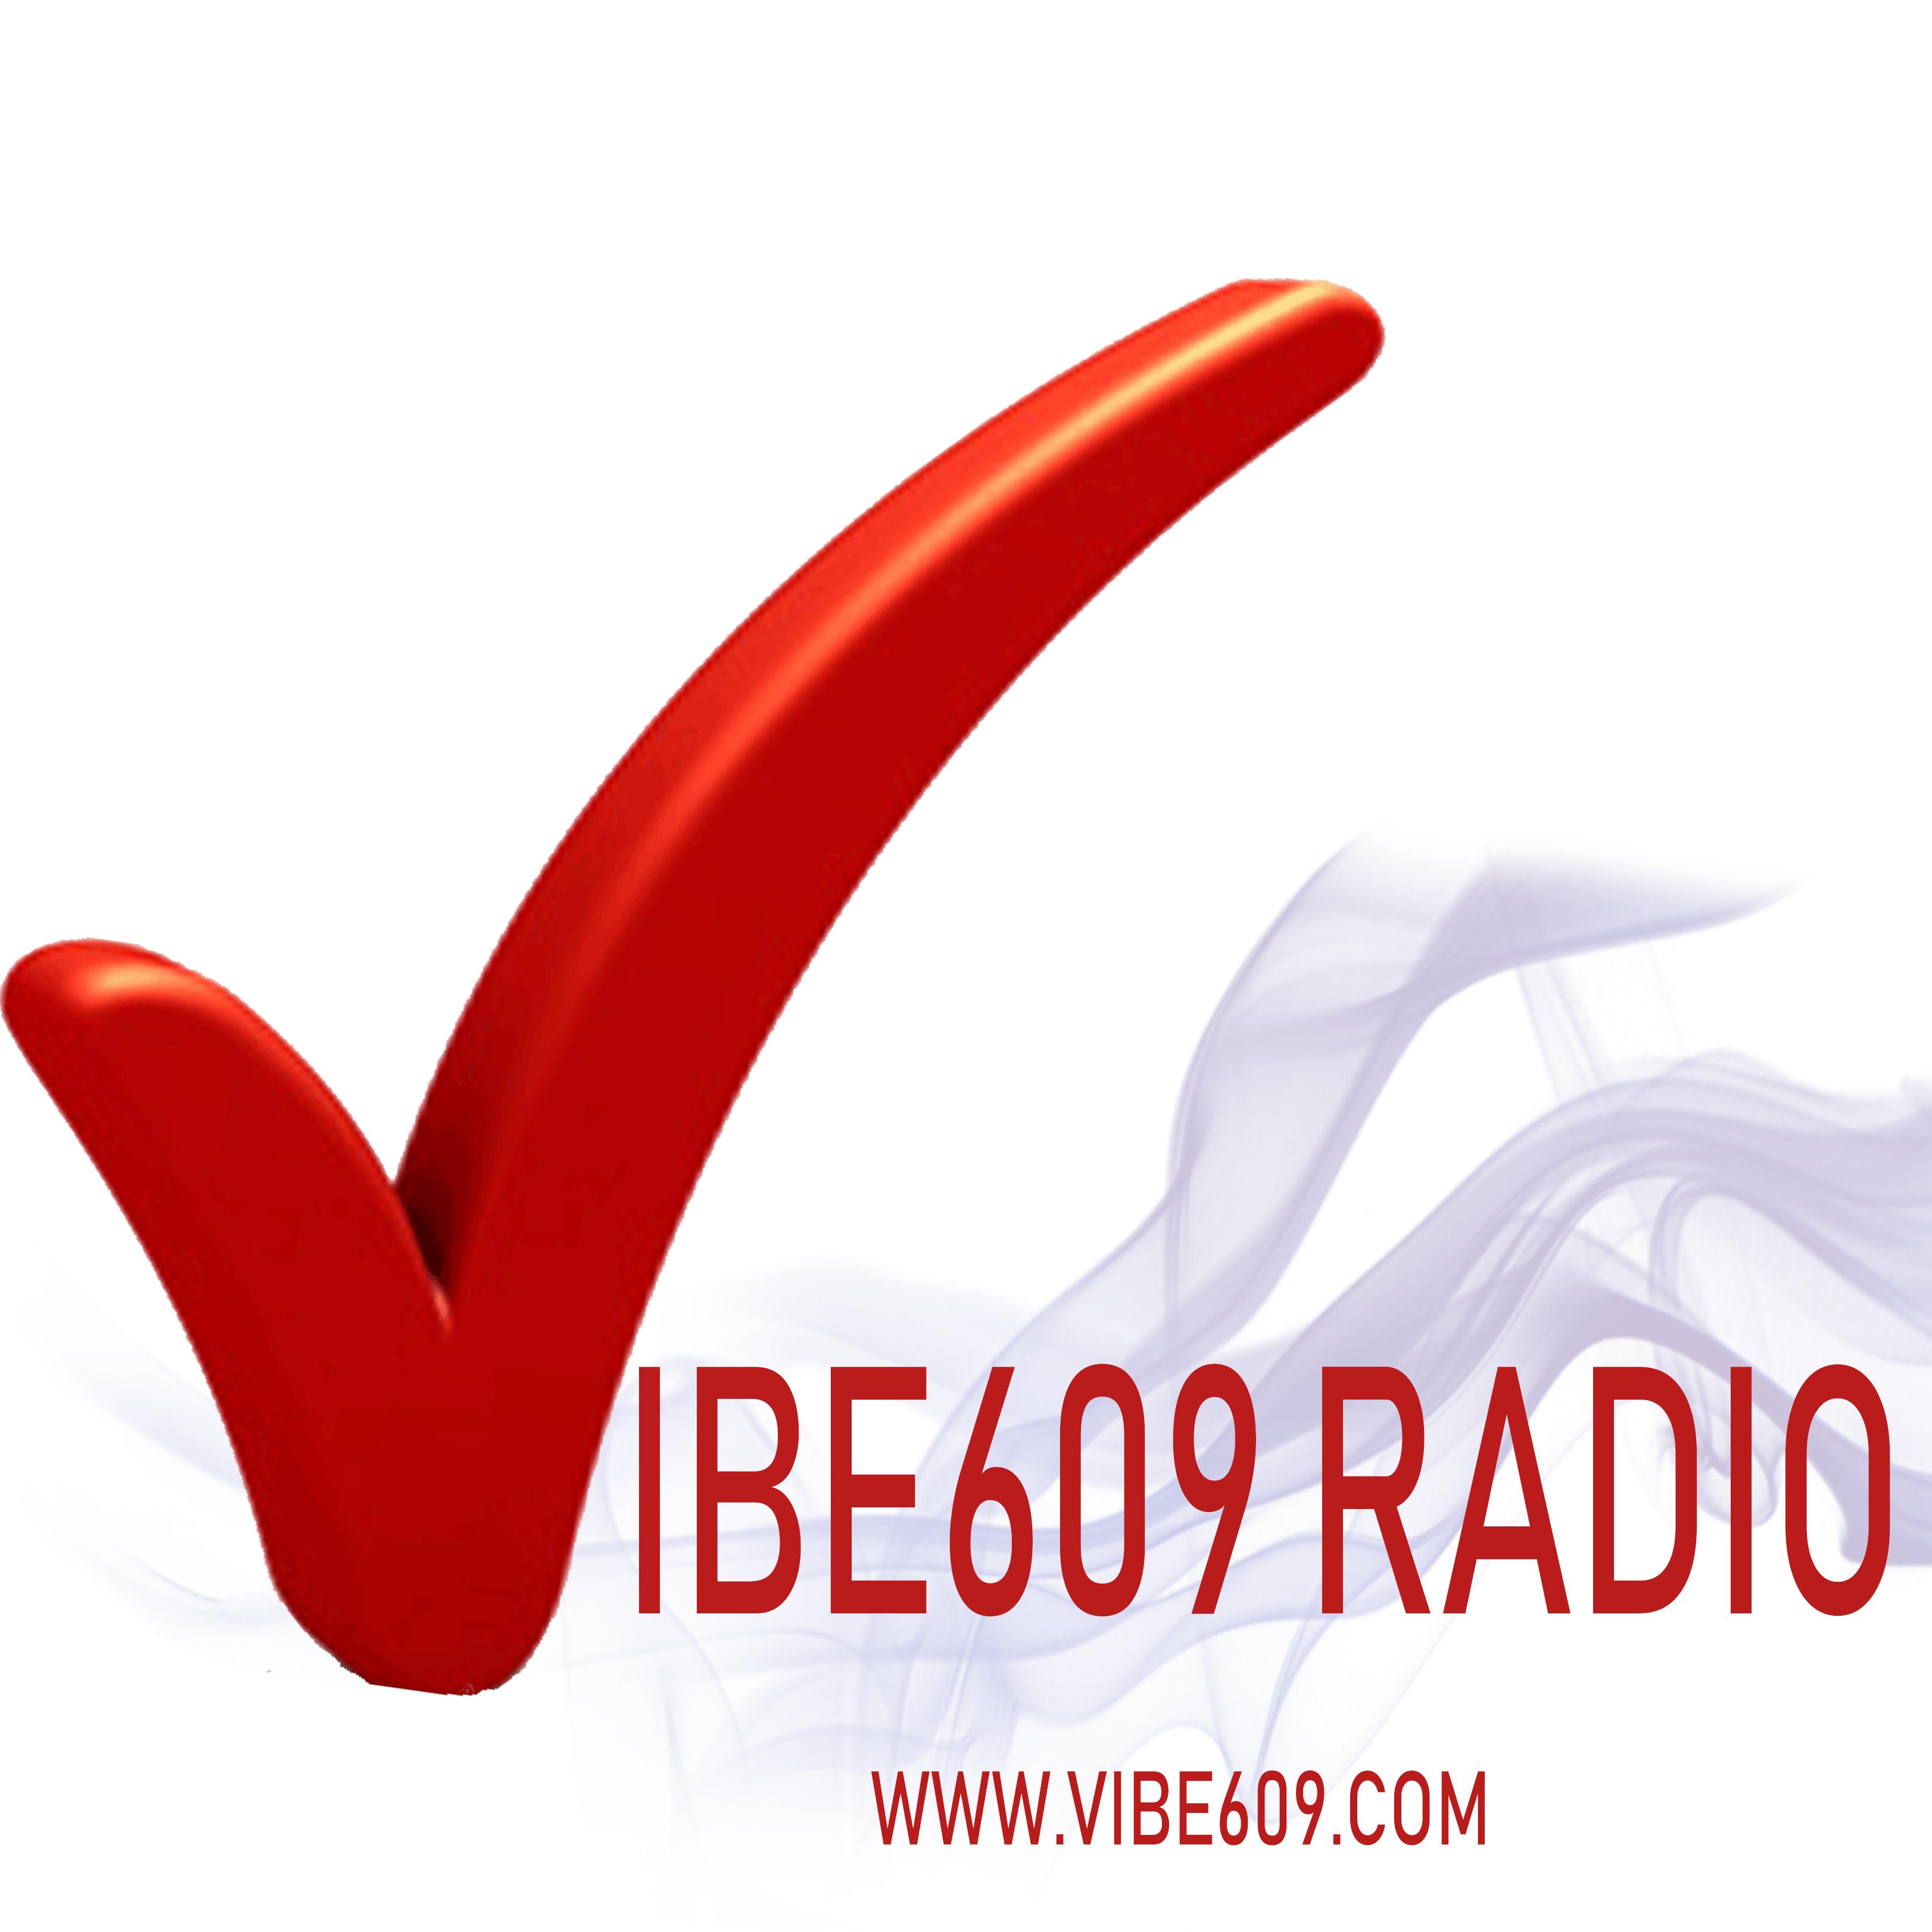 Vibe 609 Radio